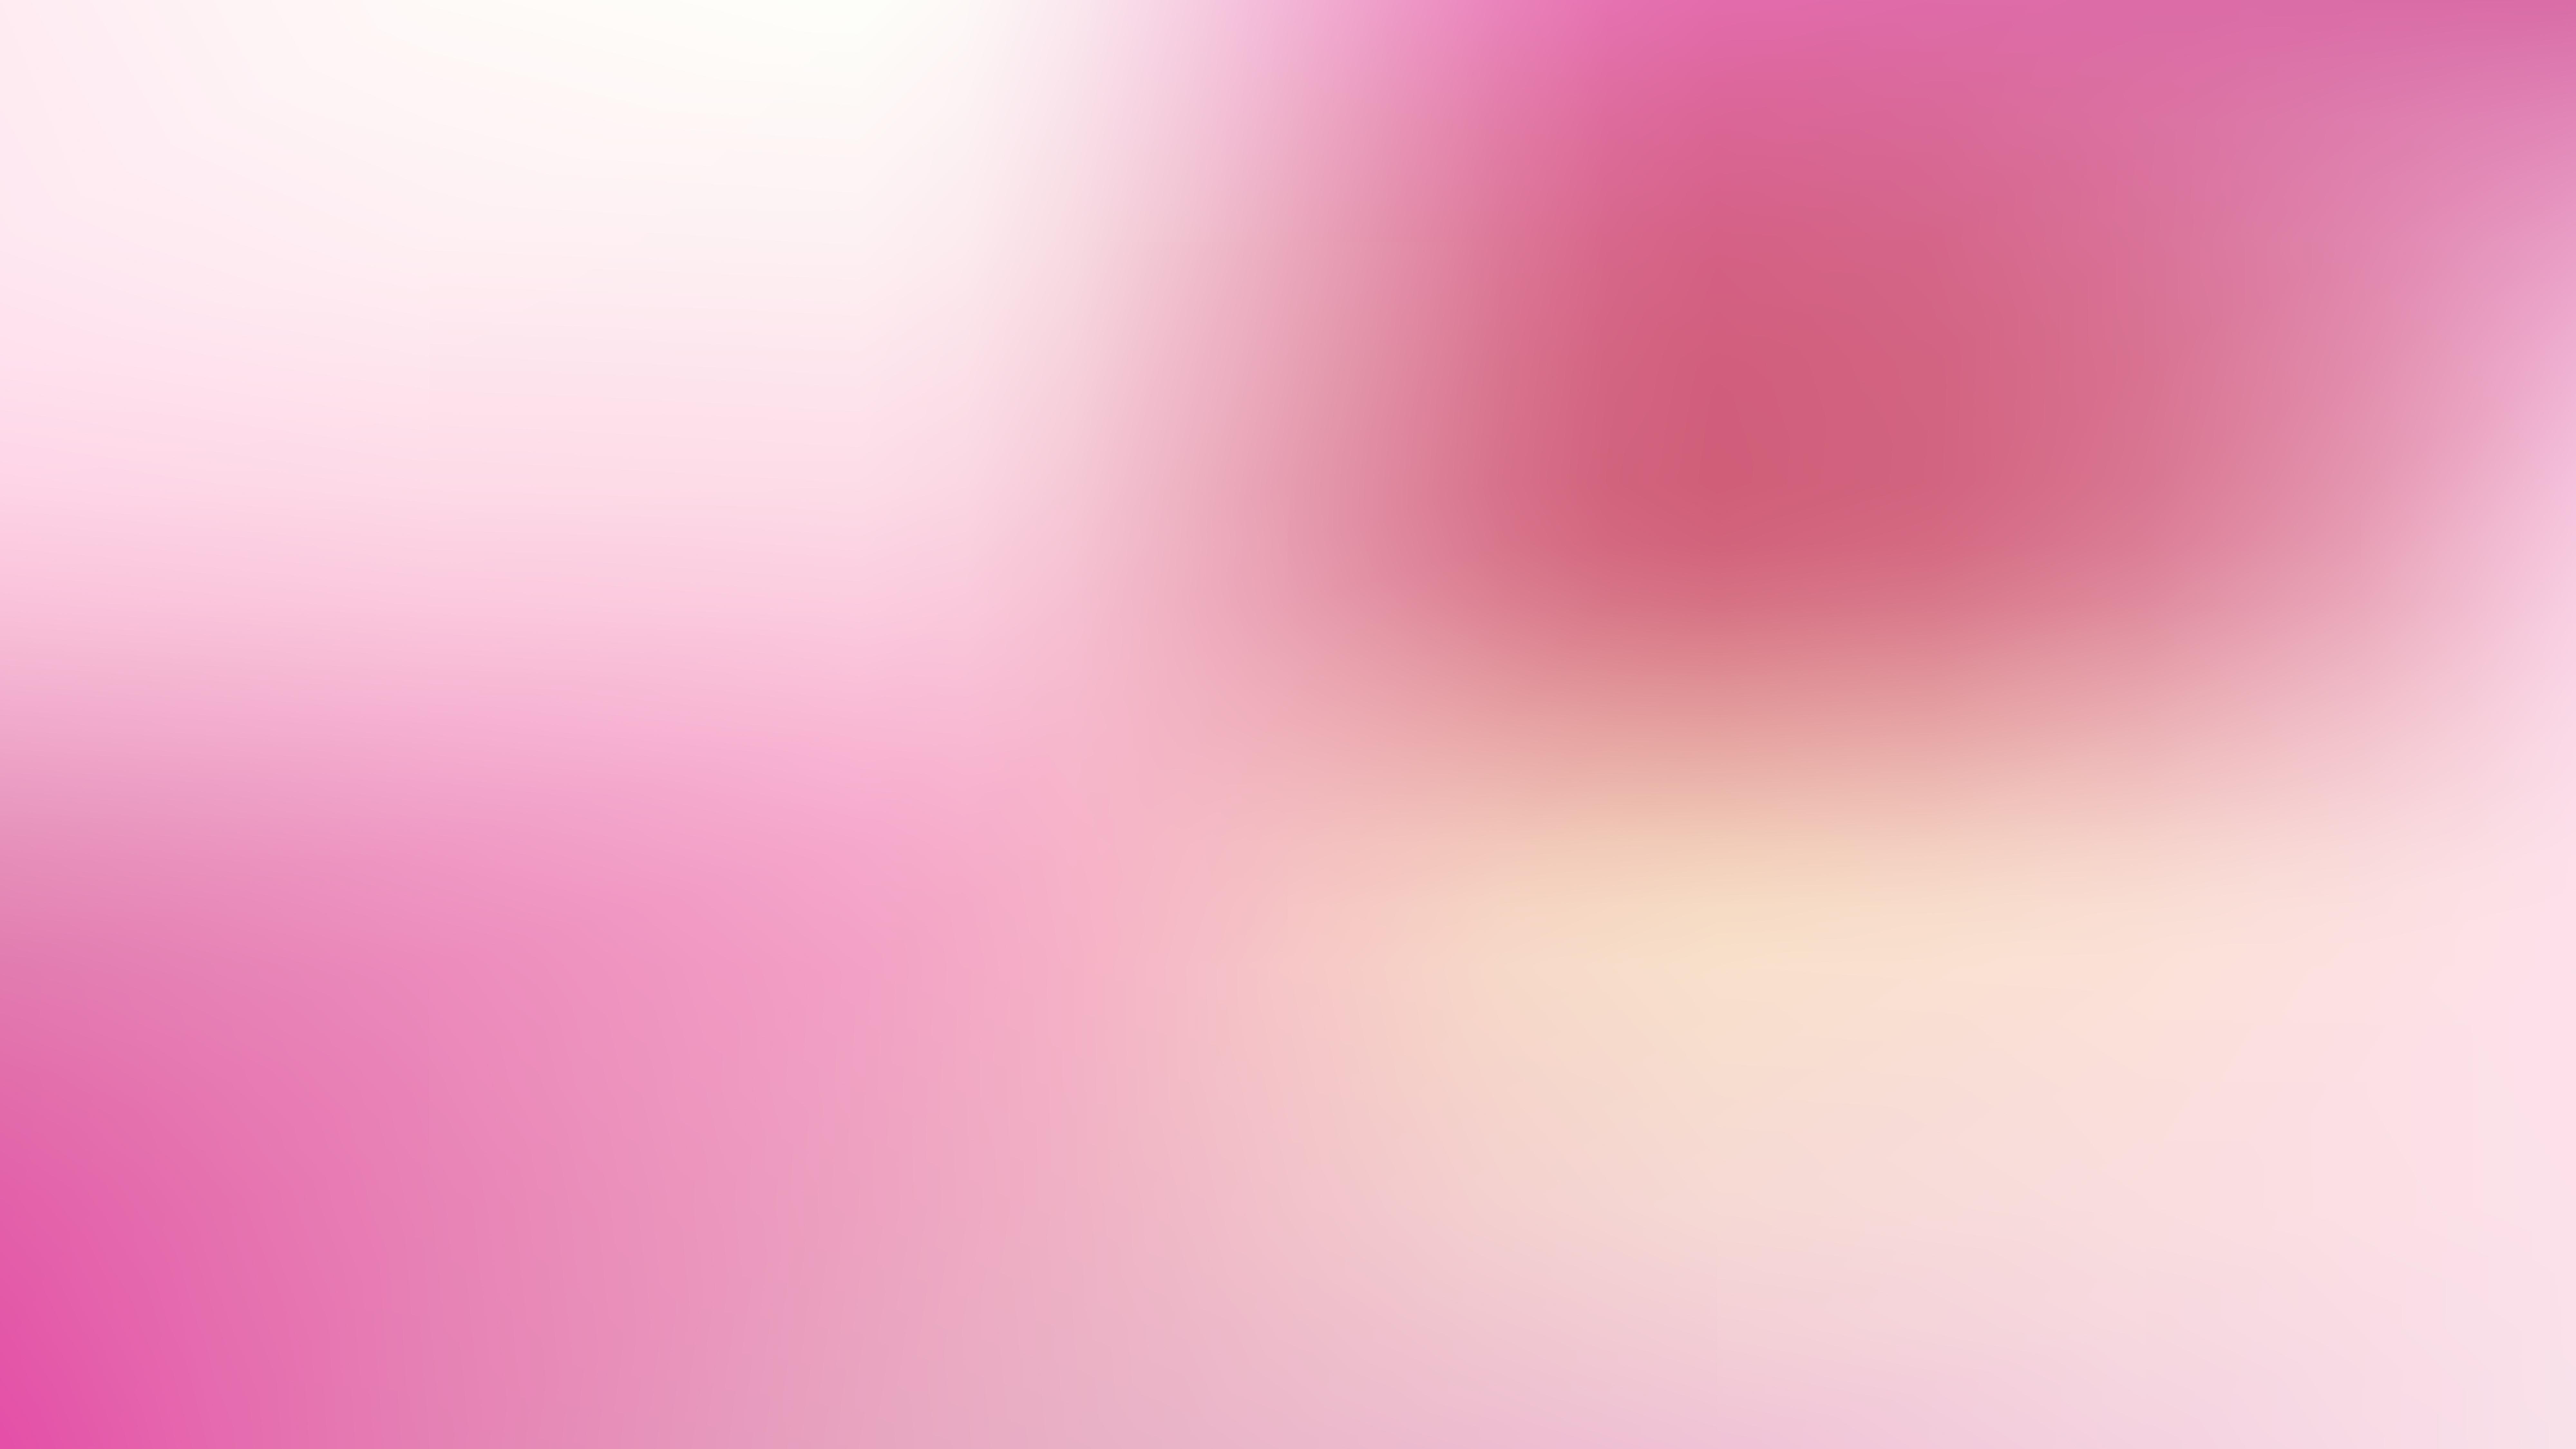 Download 5600 Background Pink Untuk Power Point Gratis Terbaik